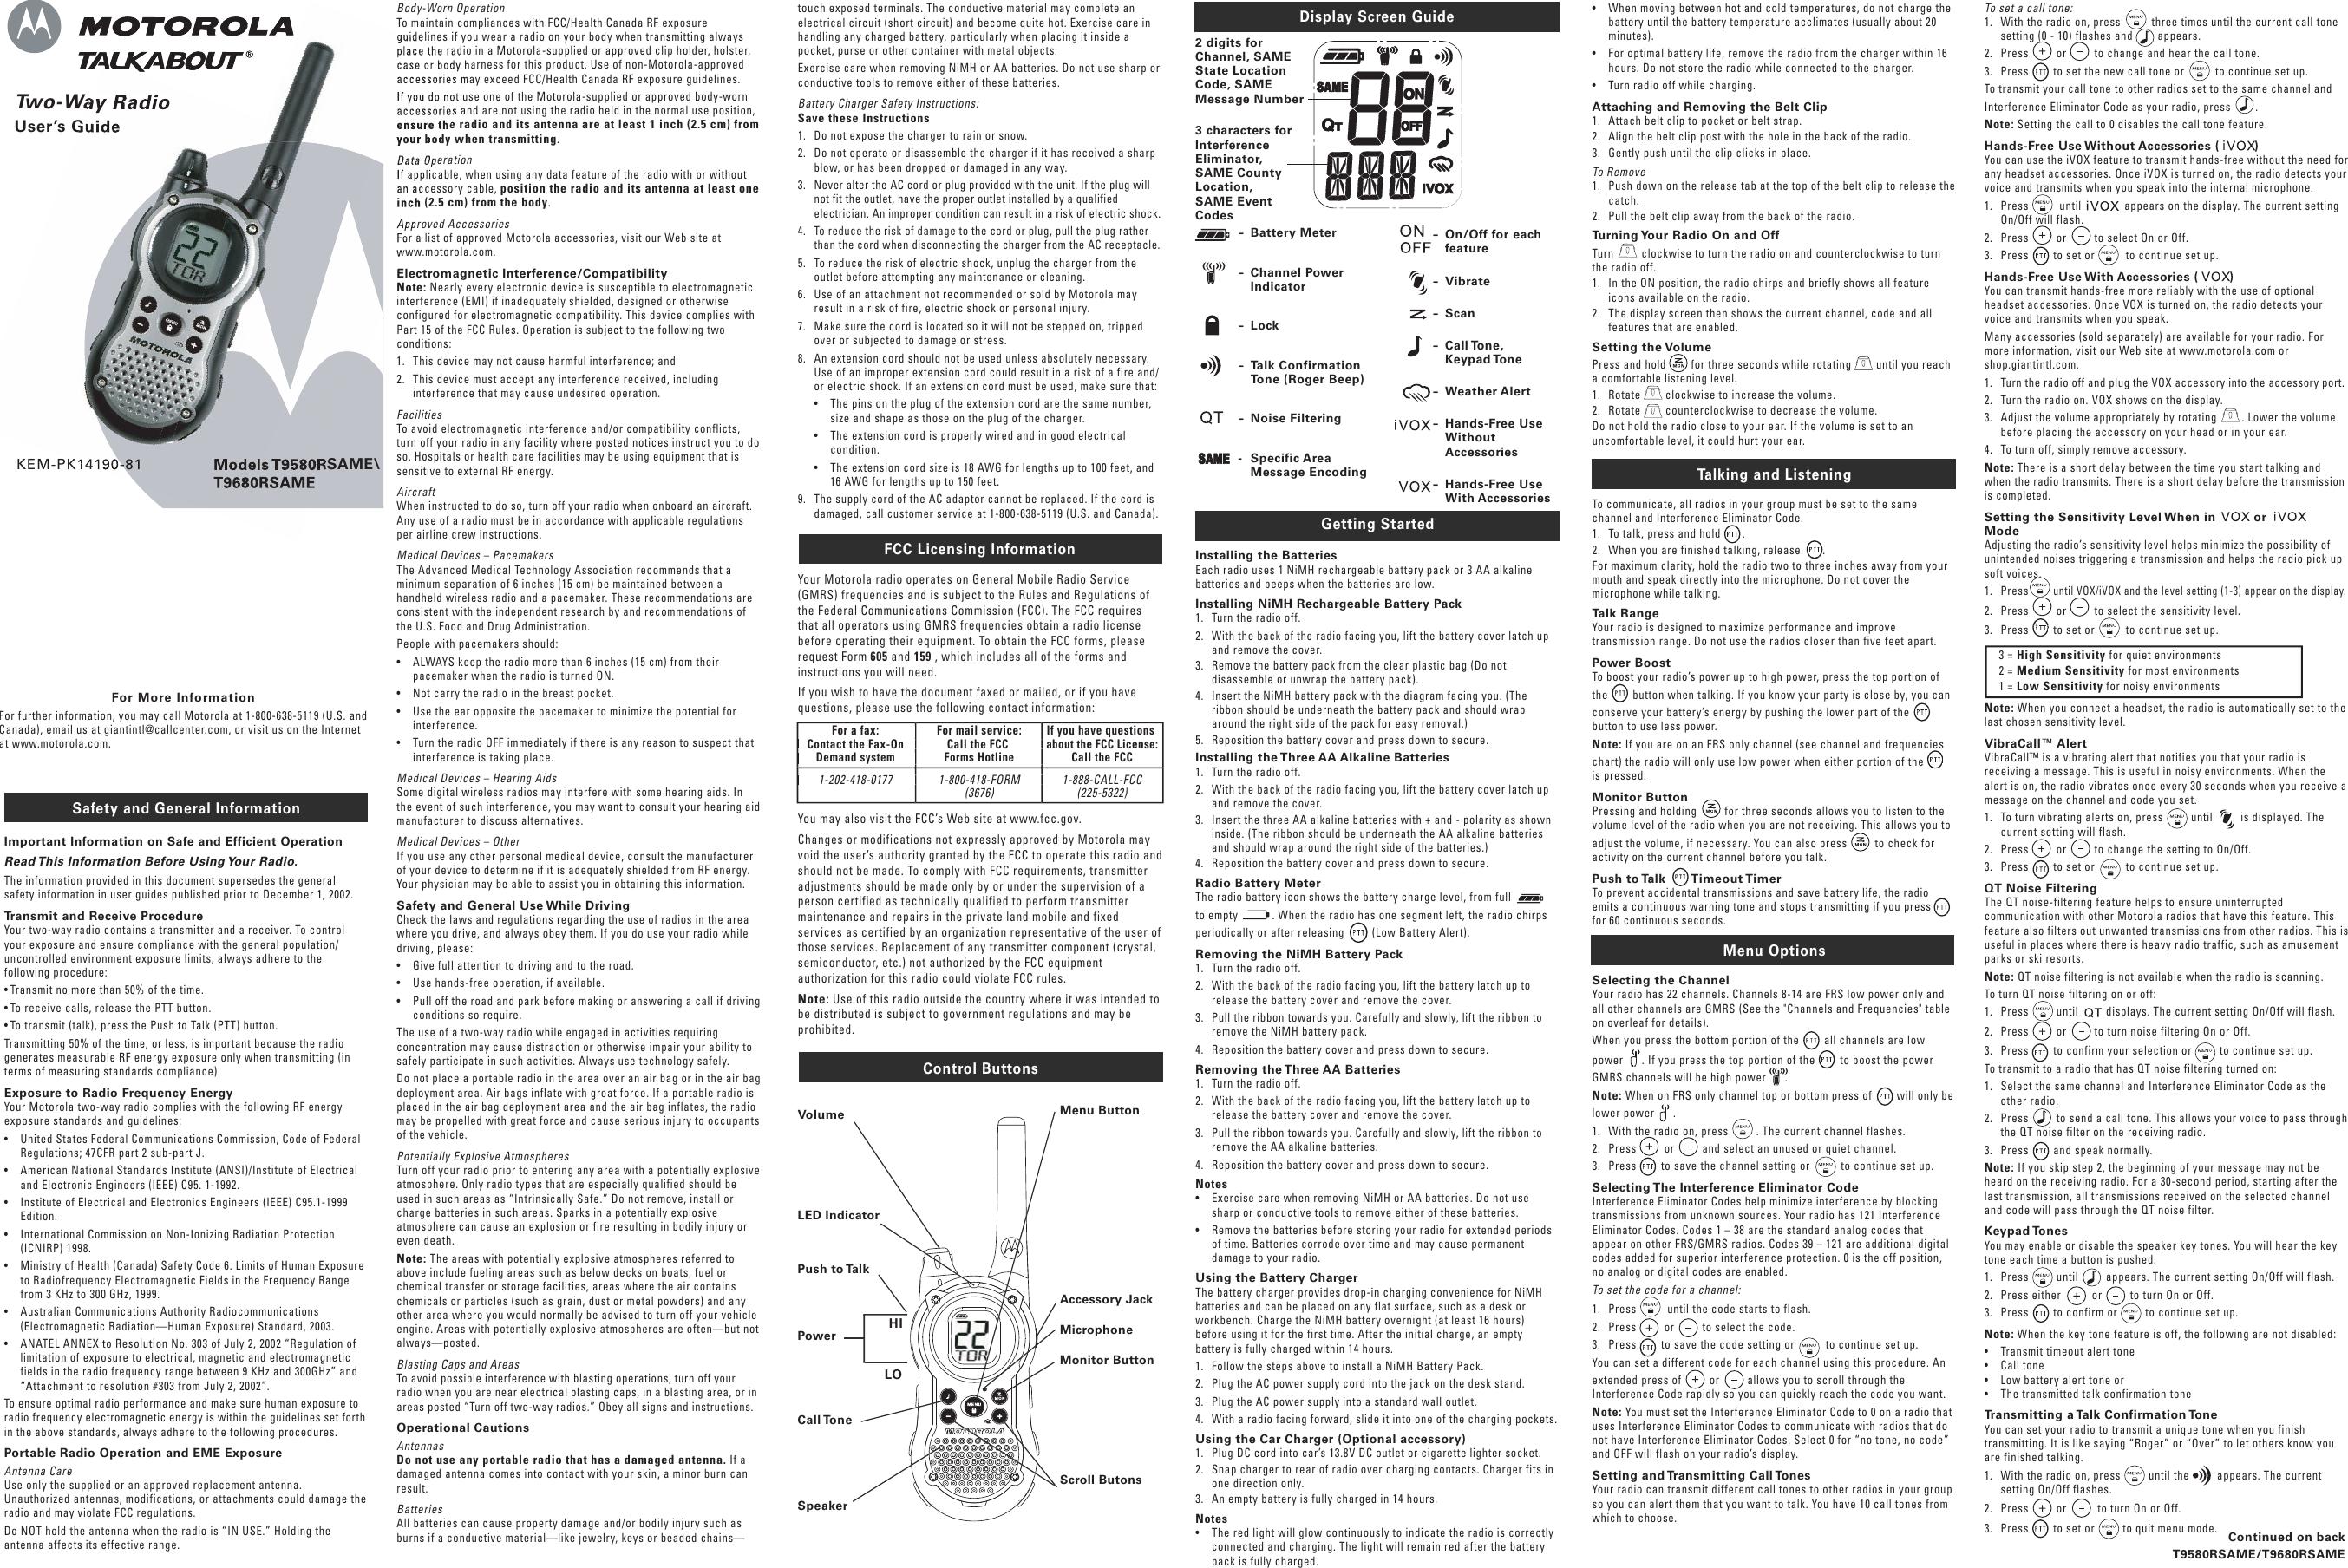 motorola talkabout t9680rsame 2 way radio t9680r users manual rh usermanual wiki motorola talkabout fr60 user manual motorola talkabout t5100 user manual